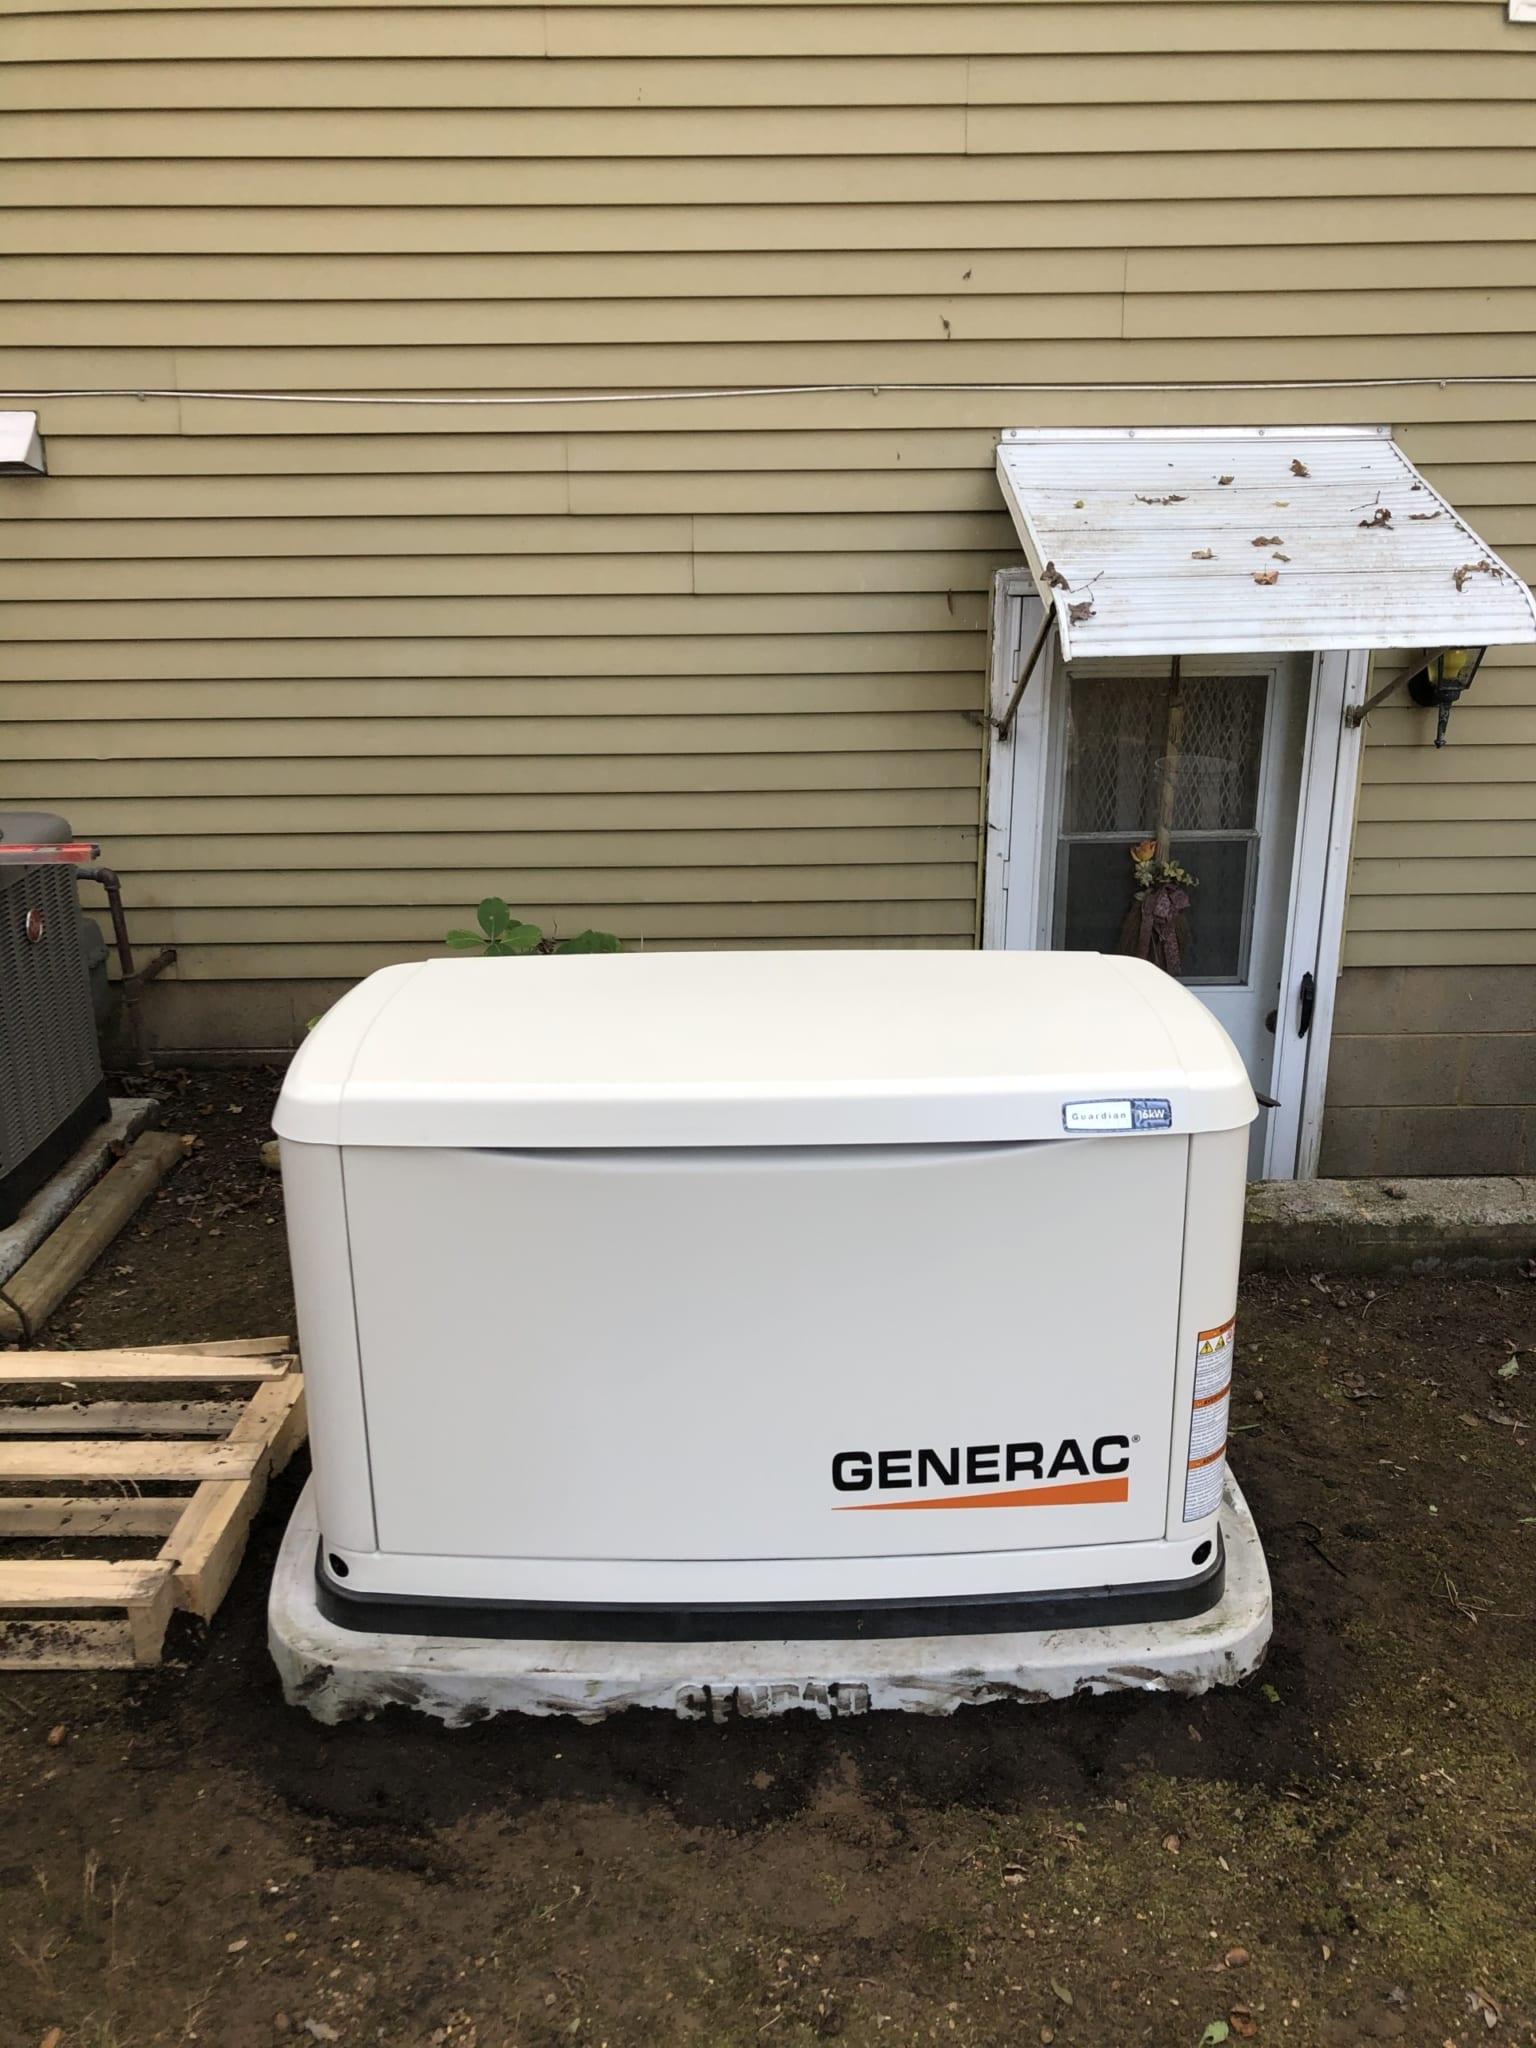 12.8.20 Richmond Generac Automatic Standby Generator